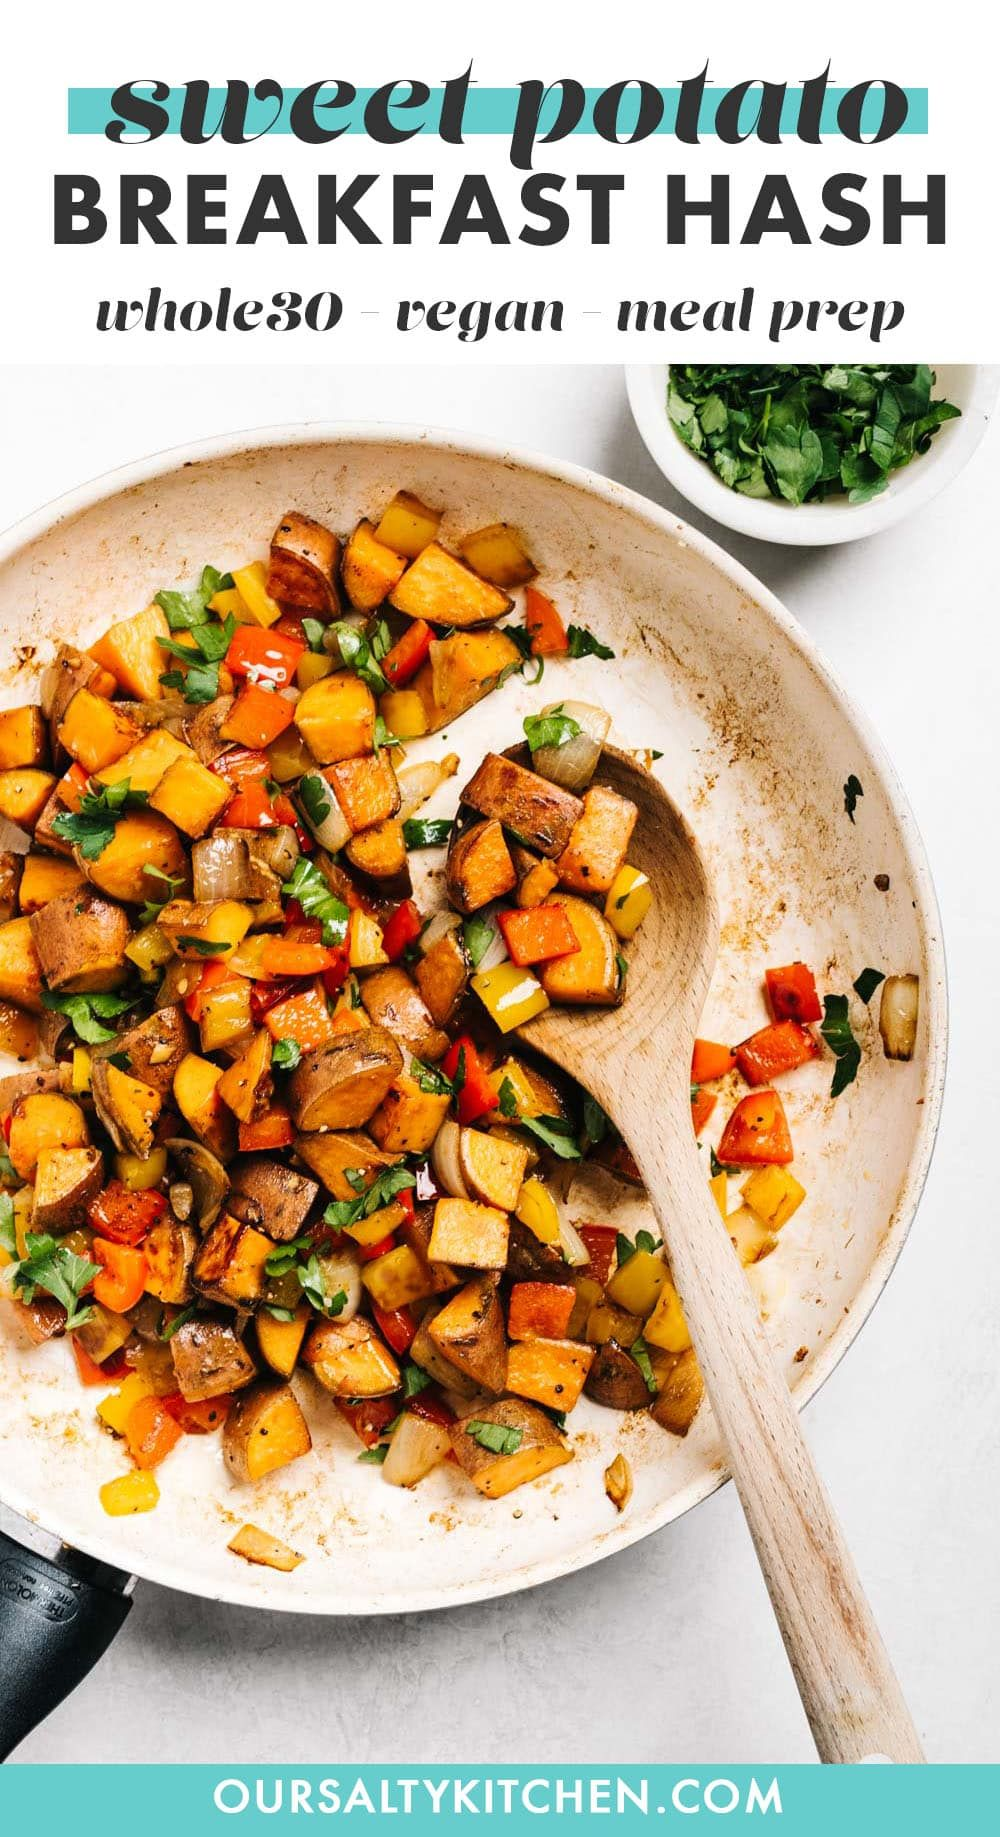 Sweet Potato Hash Whole30 Paleo Vegan Recipe In 2020 Sweet Potato Breakfast Hash Sweet Potato Hash Real Food Recipes